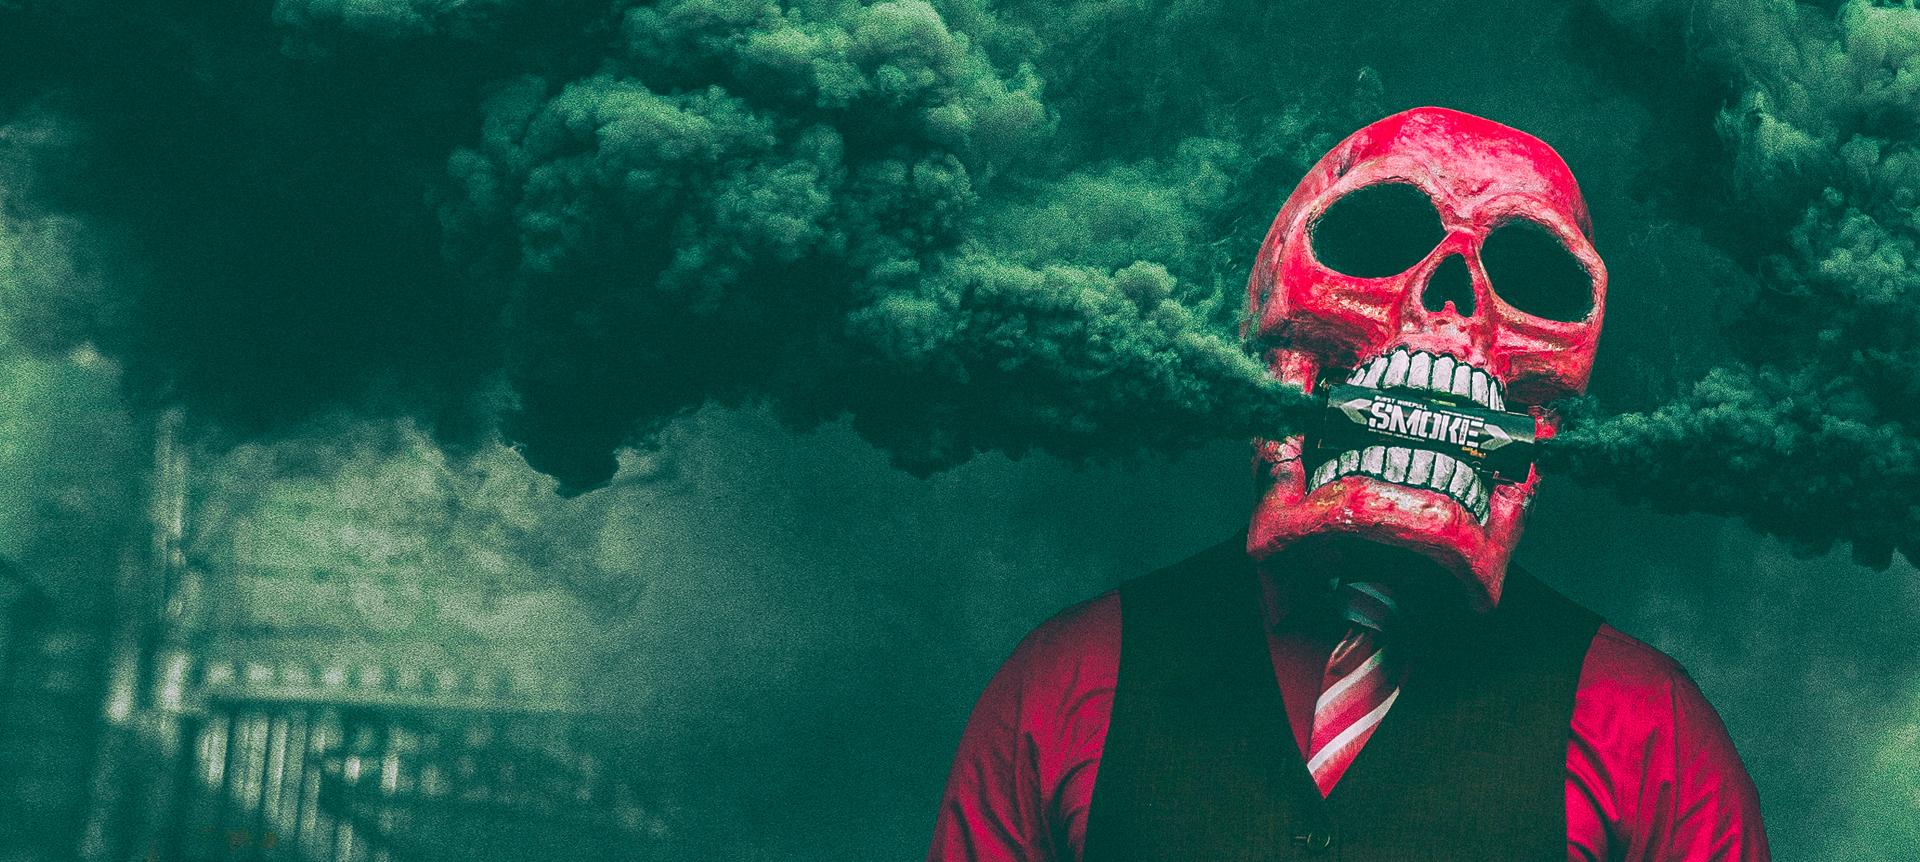 AWESOME SMOKE EFFECTS